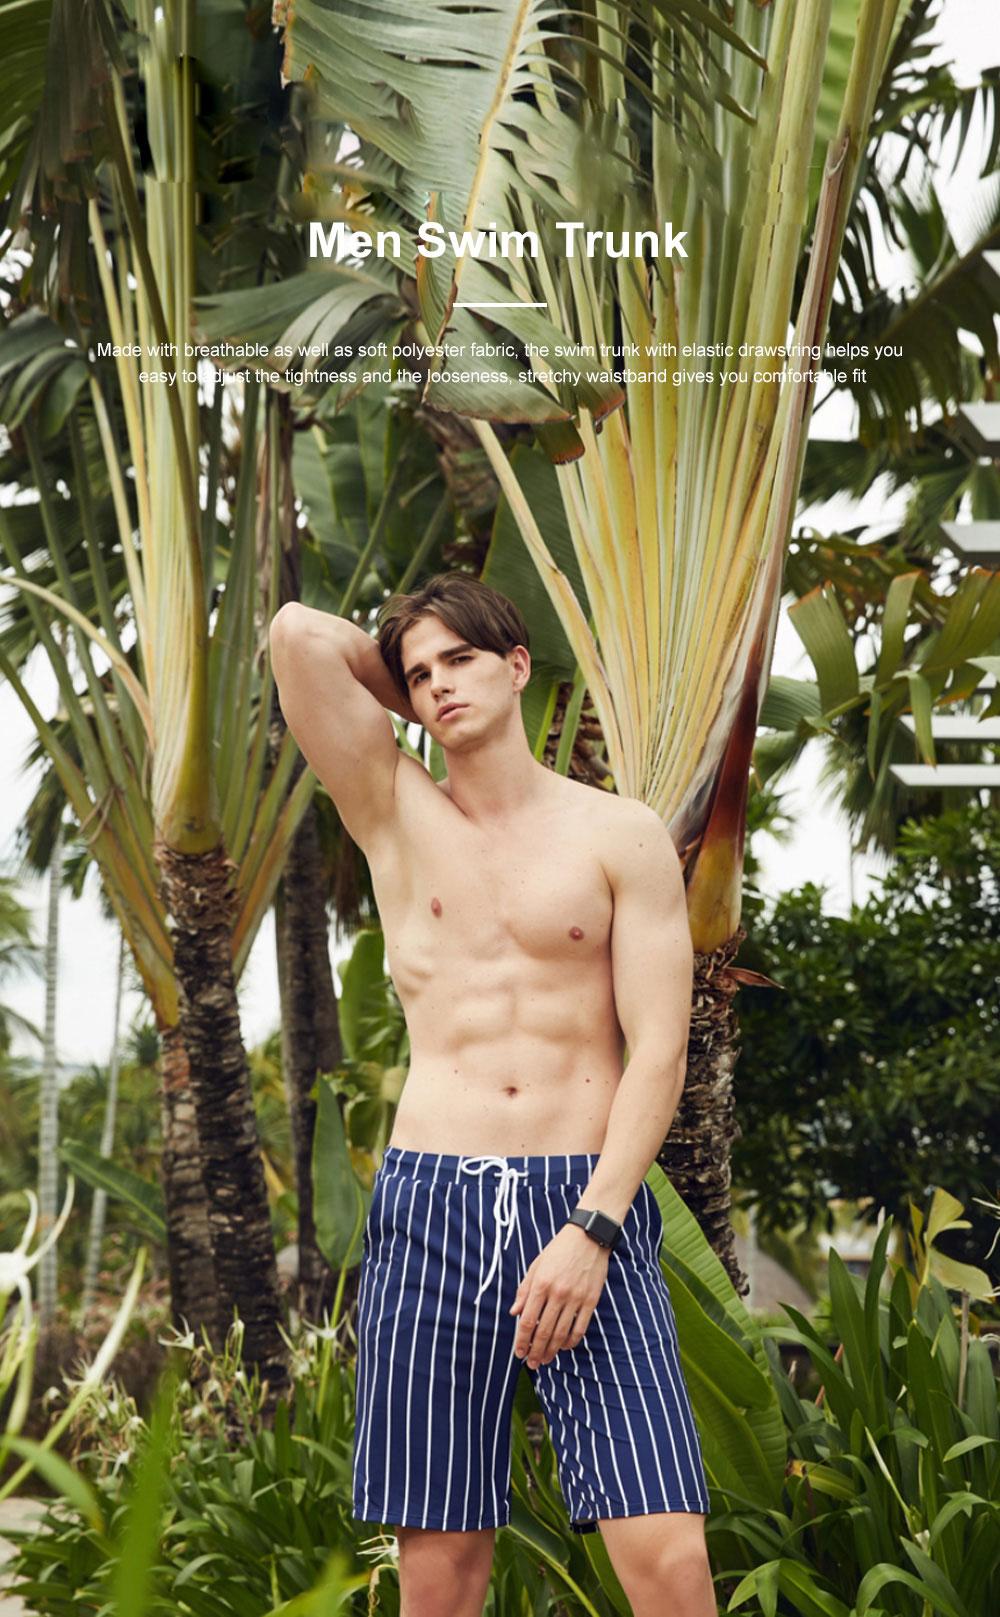 Men Beach Pants Swim Trunk Half Size Colorful Patterns Waterproof Loosing Shorts For Swimming Beach Spring Summer 0